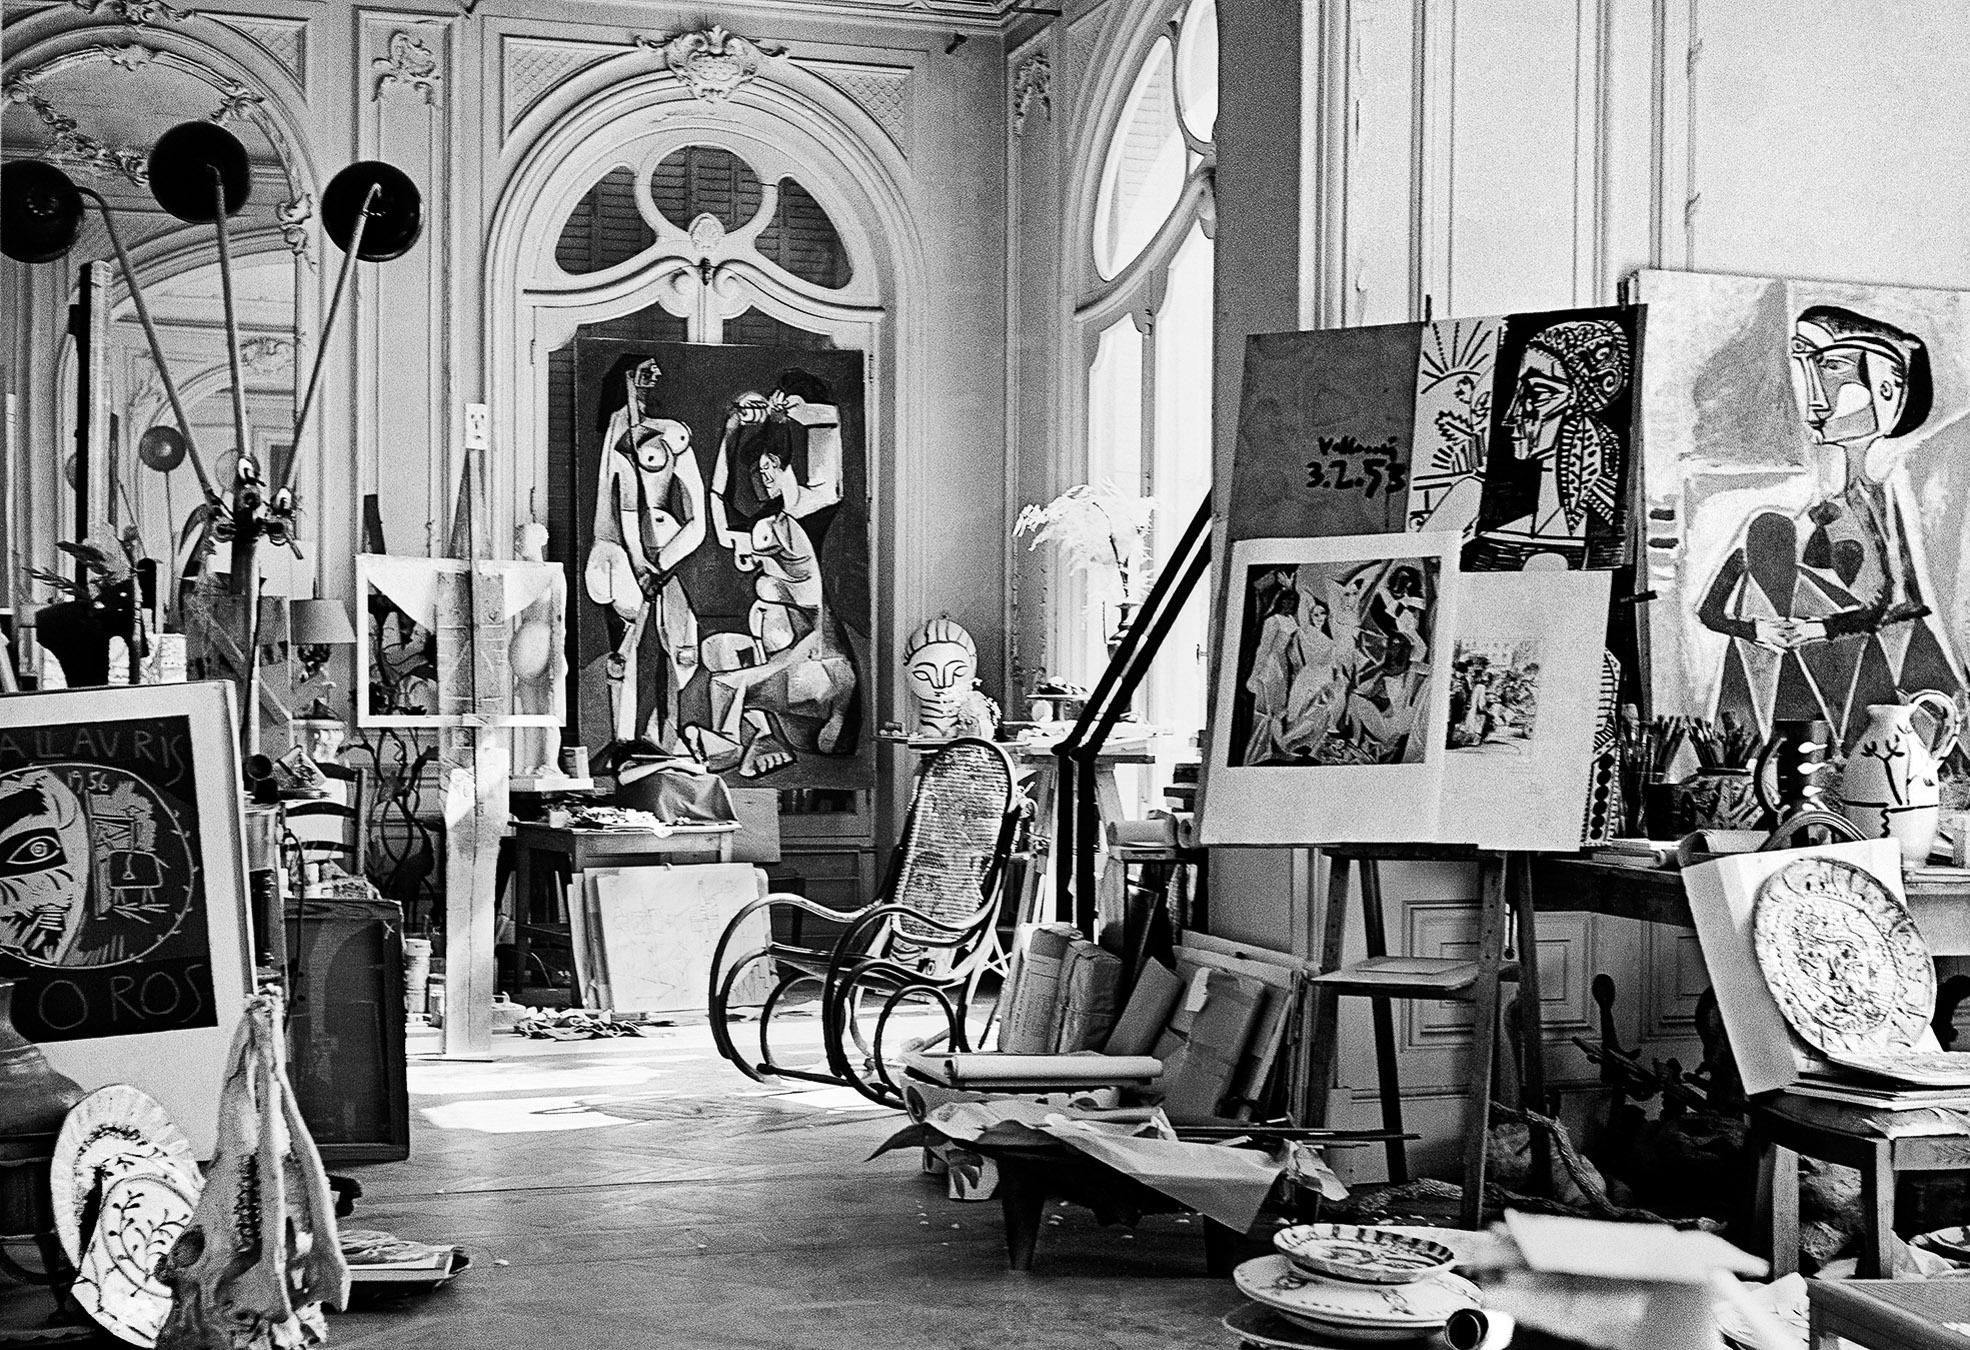 Atelier Picasso, Villa La Californie, Cannes c 1955 Canson fine art print, mounted, printed 2017 85.5x72.5cm, Edition of 10